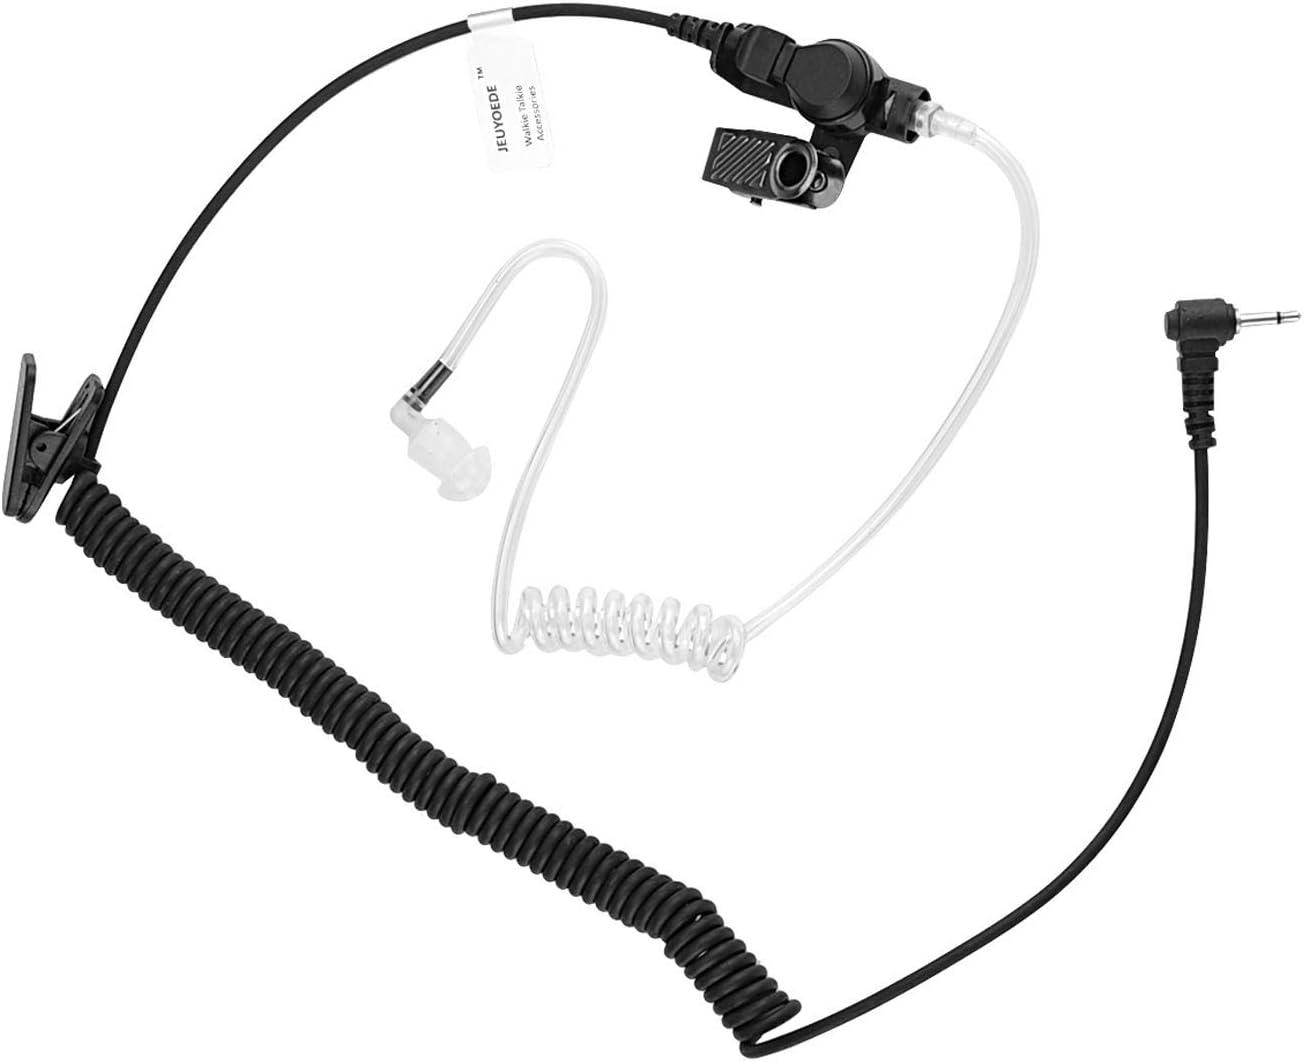 Universal 3.5mm Listen-Only Acoustic Headset//Earpiece For Radio Walkie Talkie